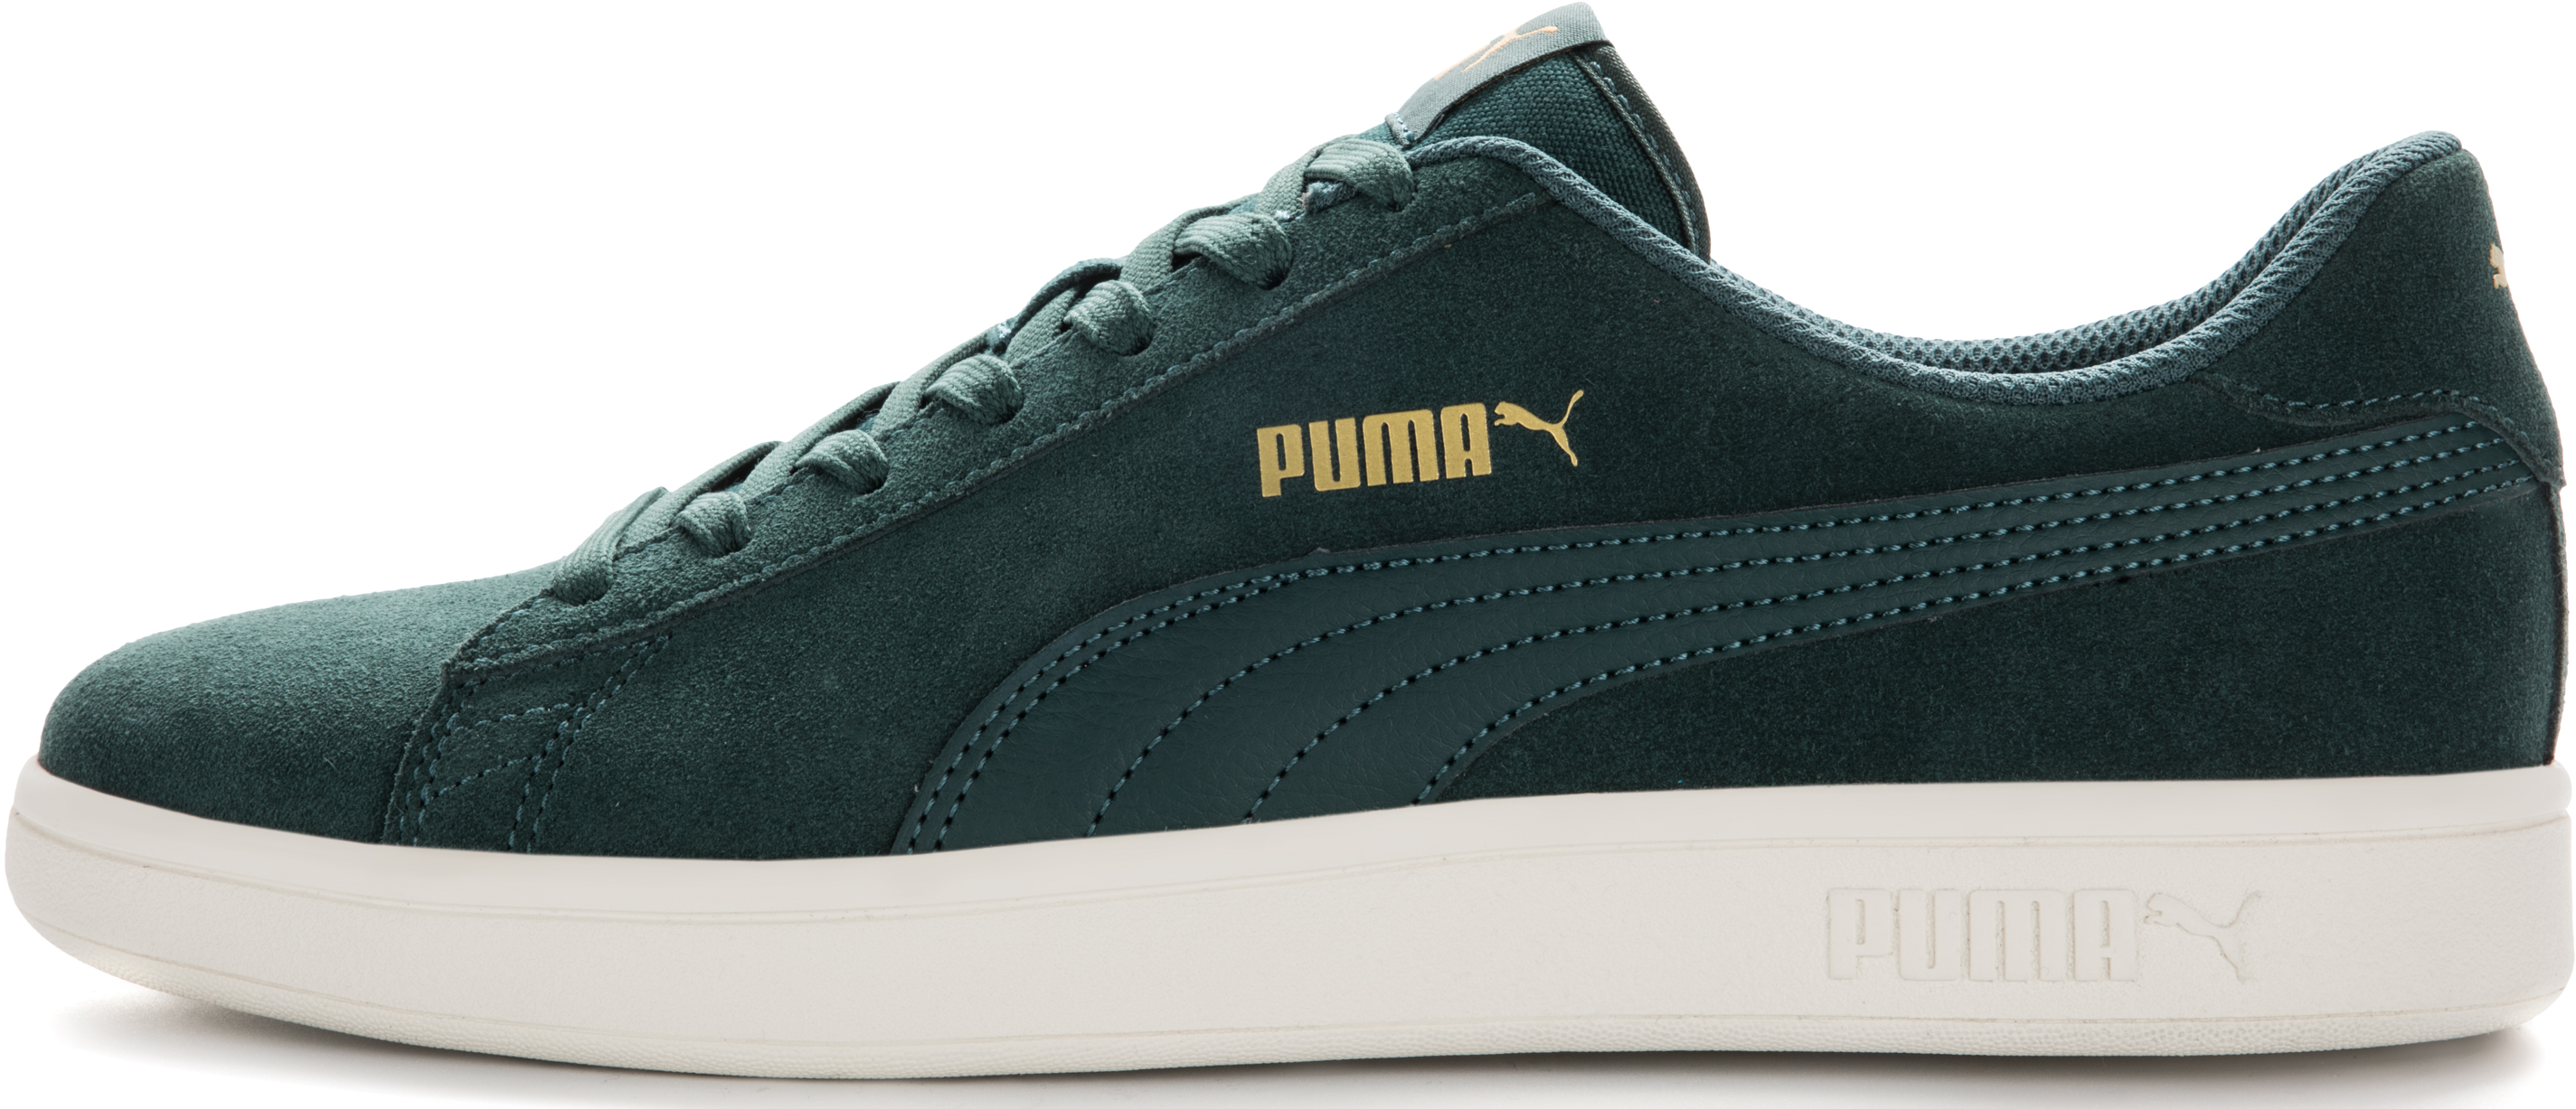 Puma Кеды мужские  Smash V2, размер 41,5